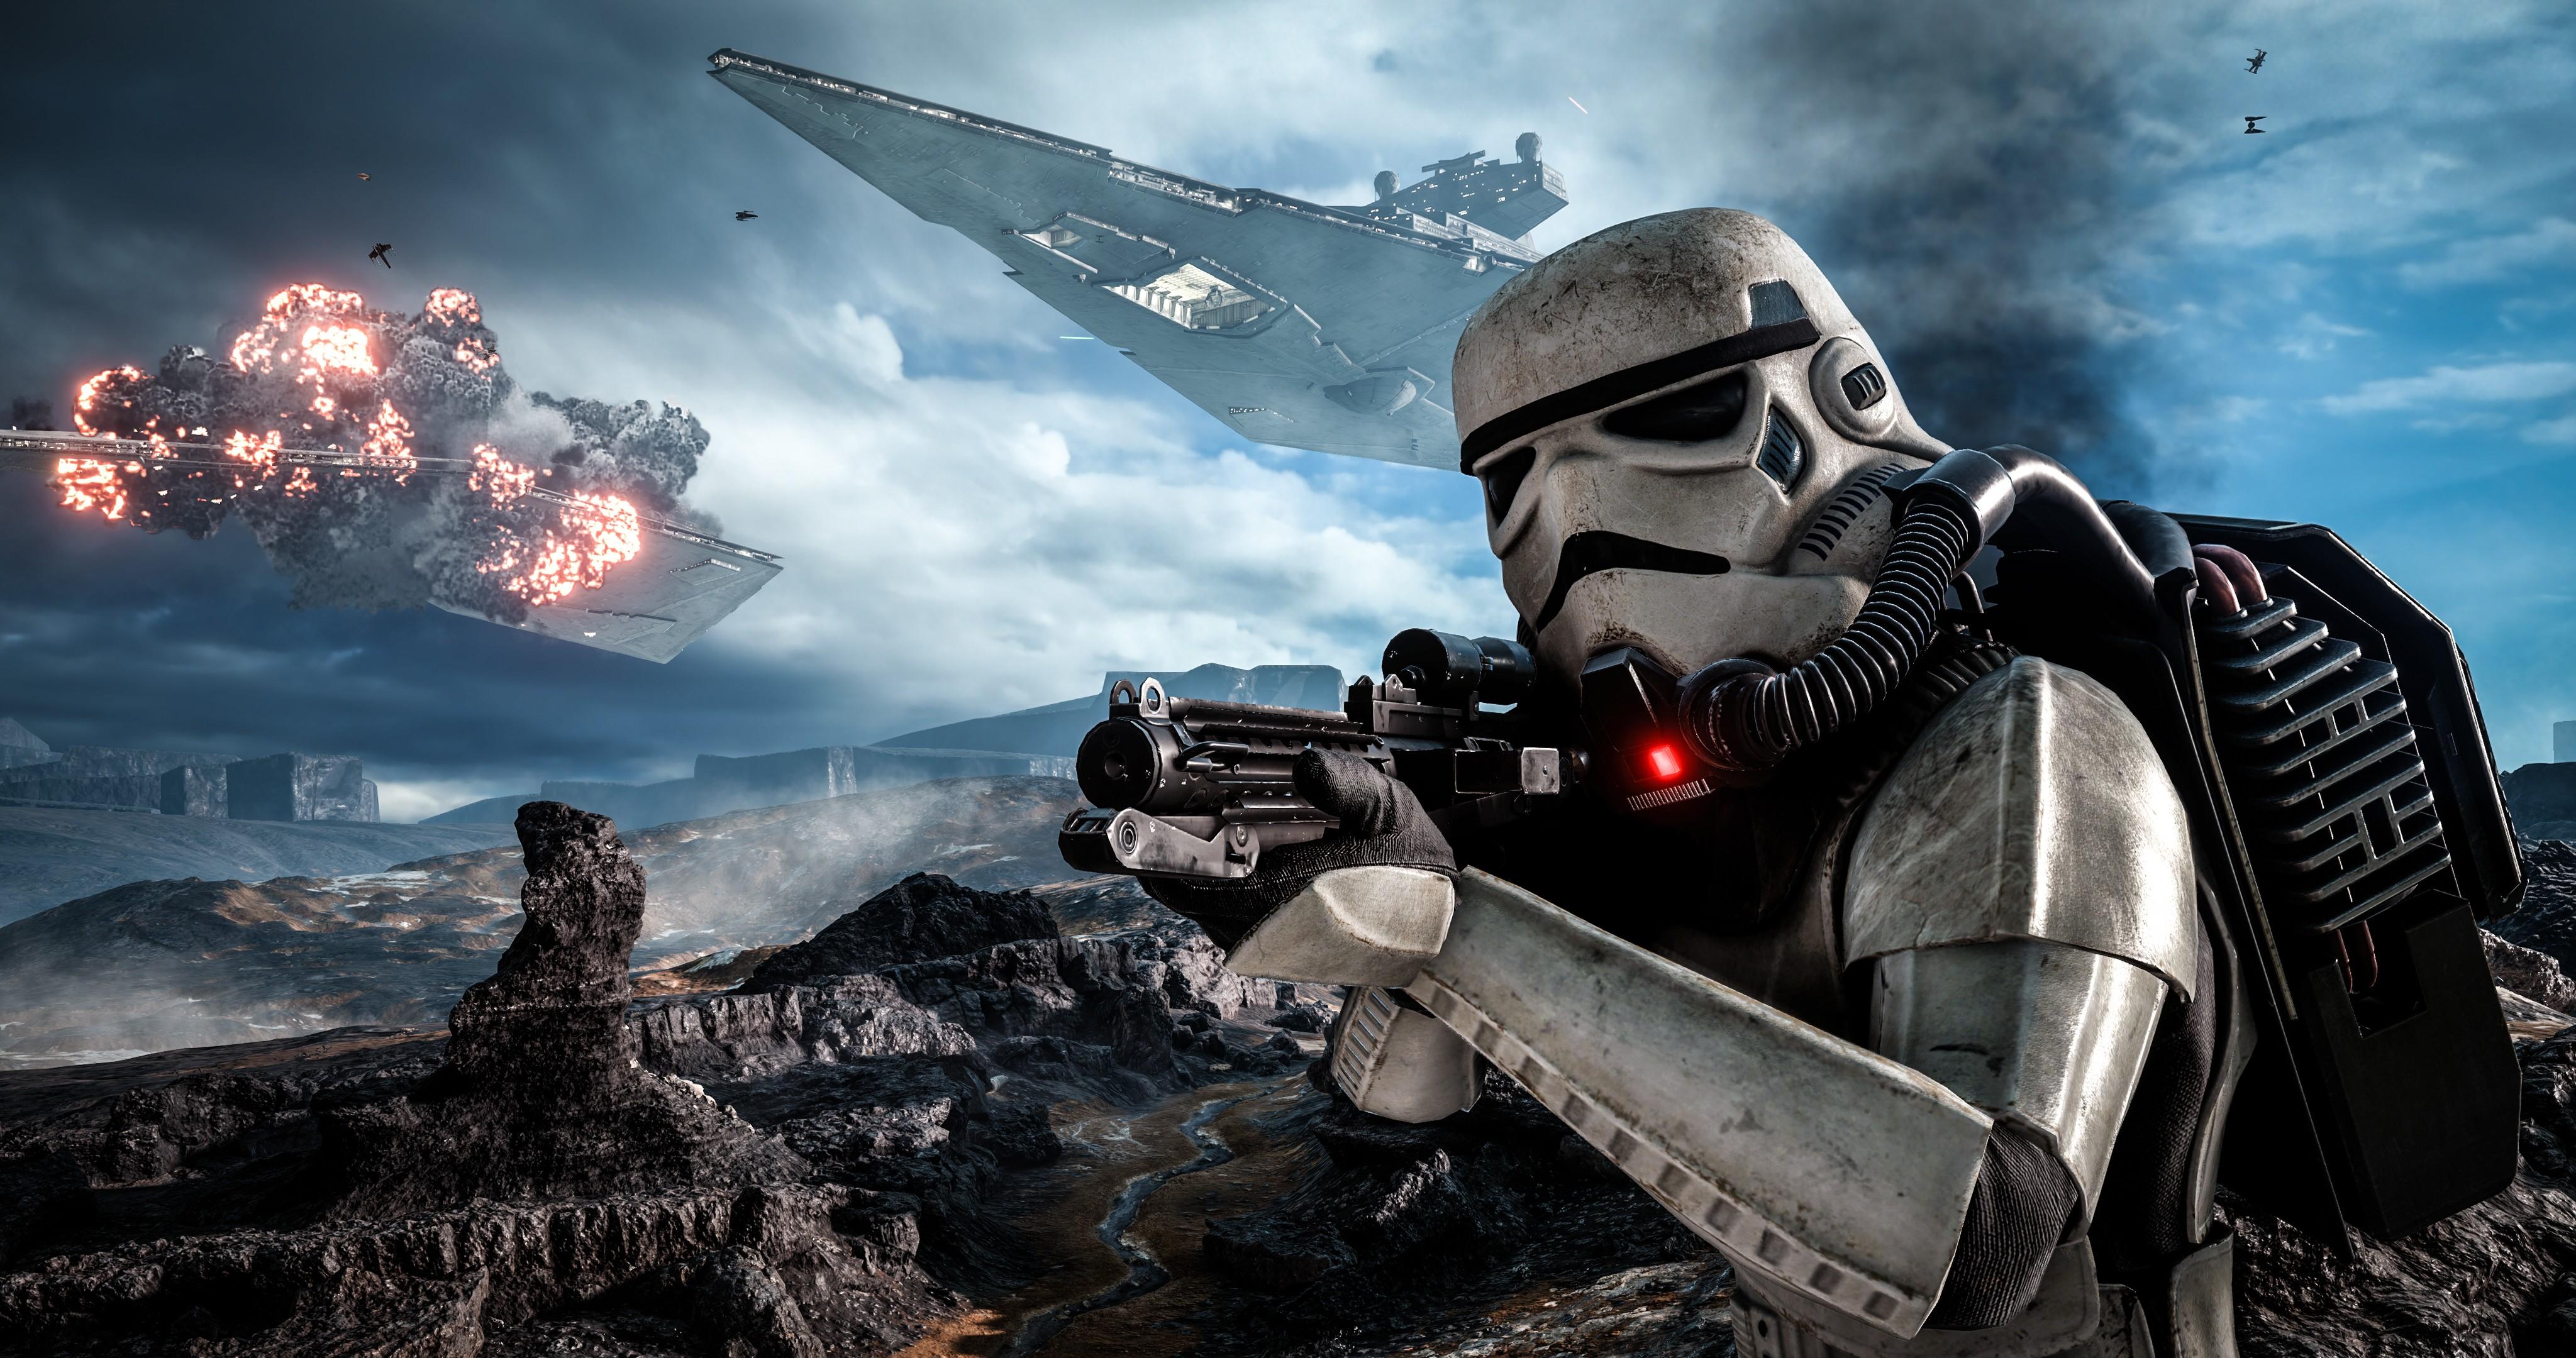 wallpaper star wars battlefront, dice, best games, game, shooter